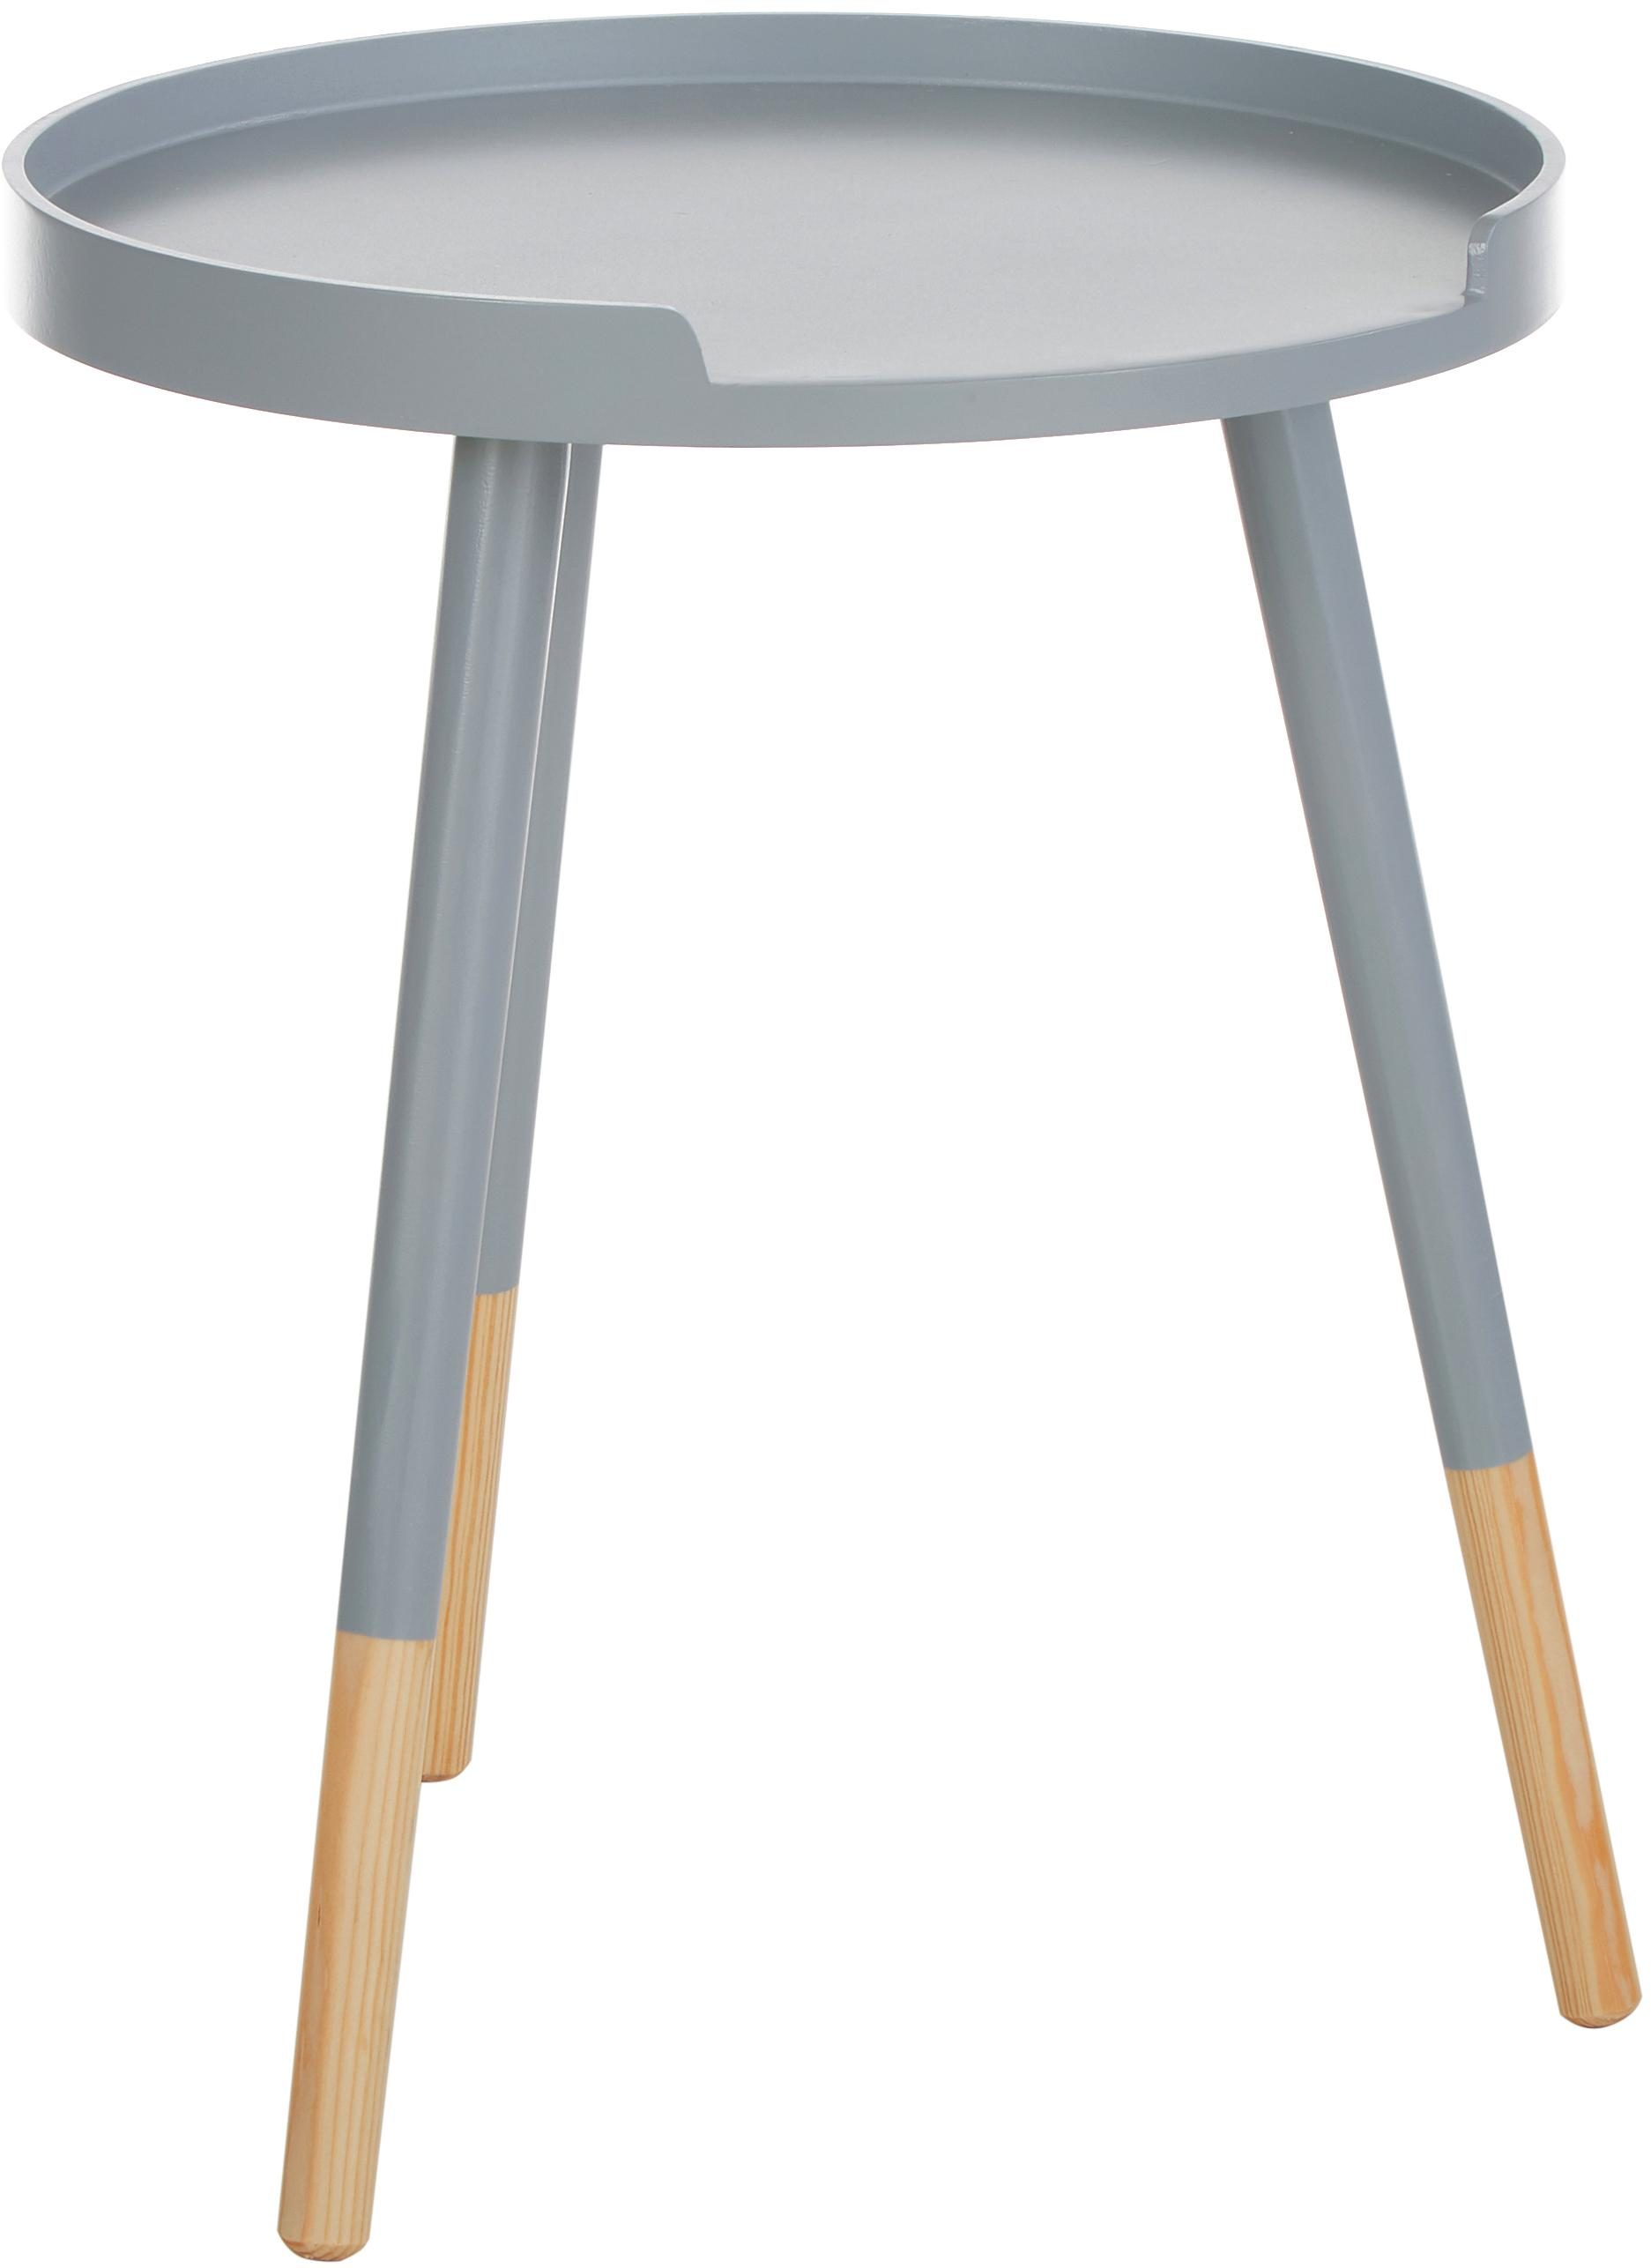 Ronde bijzettafel Ralph, Grijs, beige, Ø 40 x H 49 cm